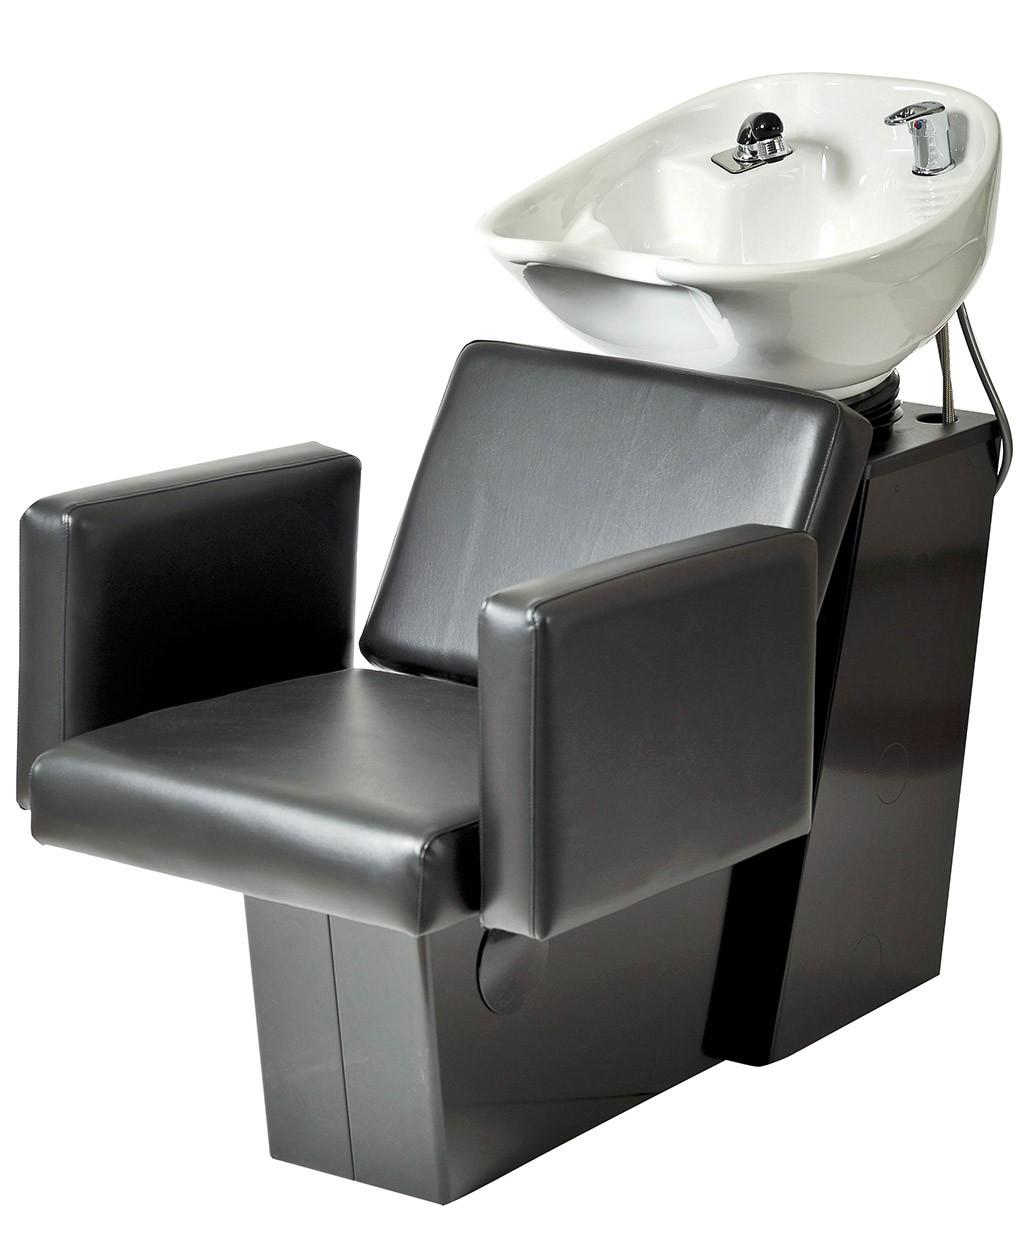 Pibbs 5234 Cosmo Backwash Unit